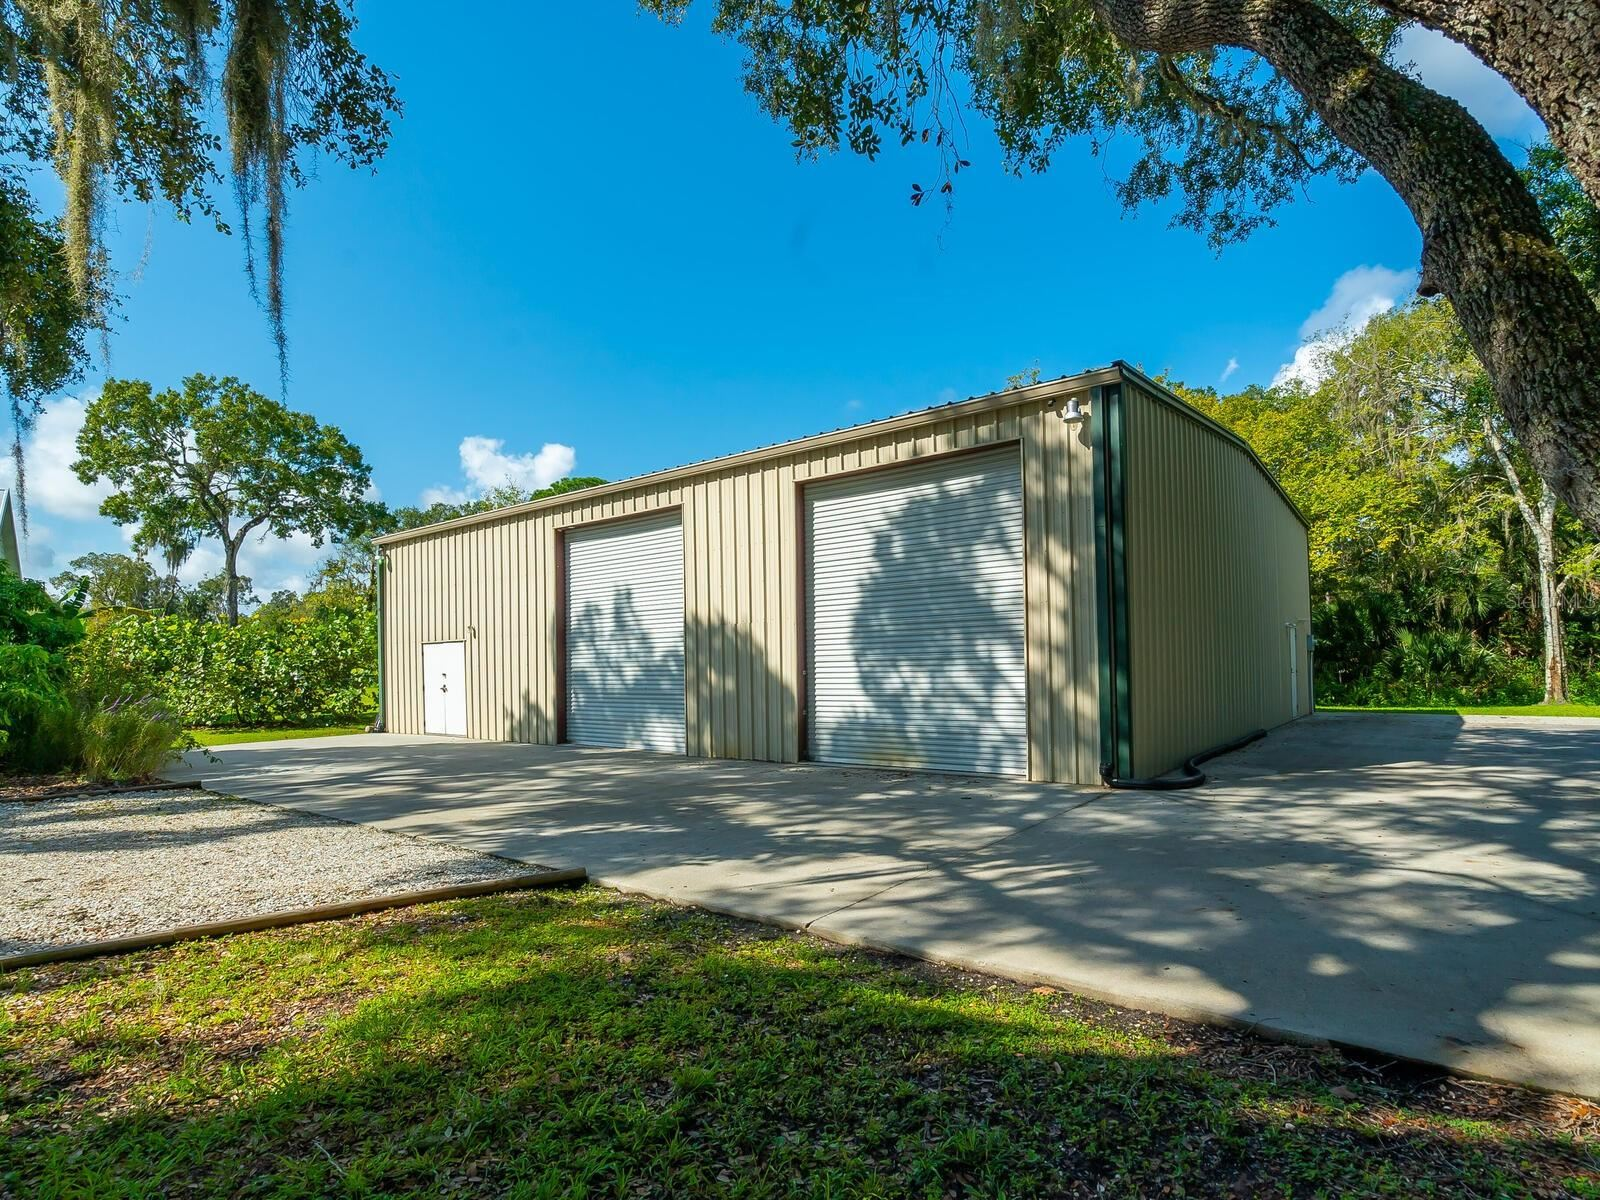 Photo of 5912 13TH AVENUE E, BRADENTON, FL 34208 (MLS # A4511633)